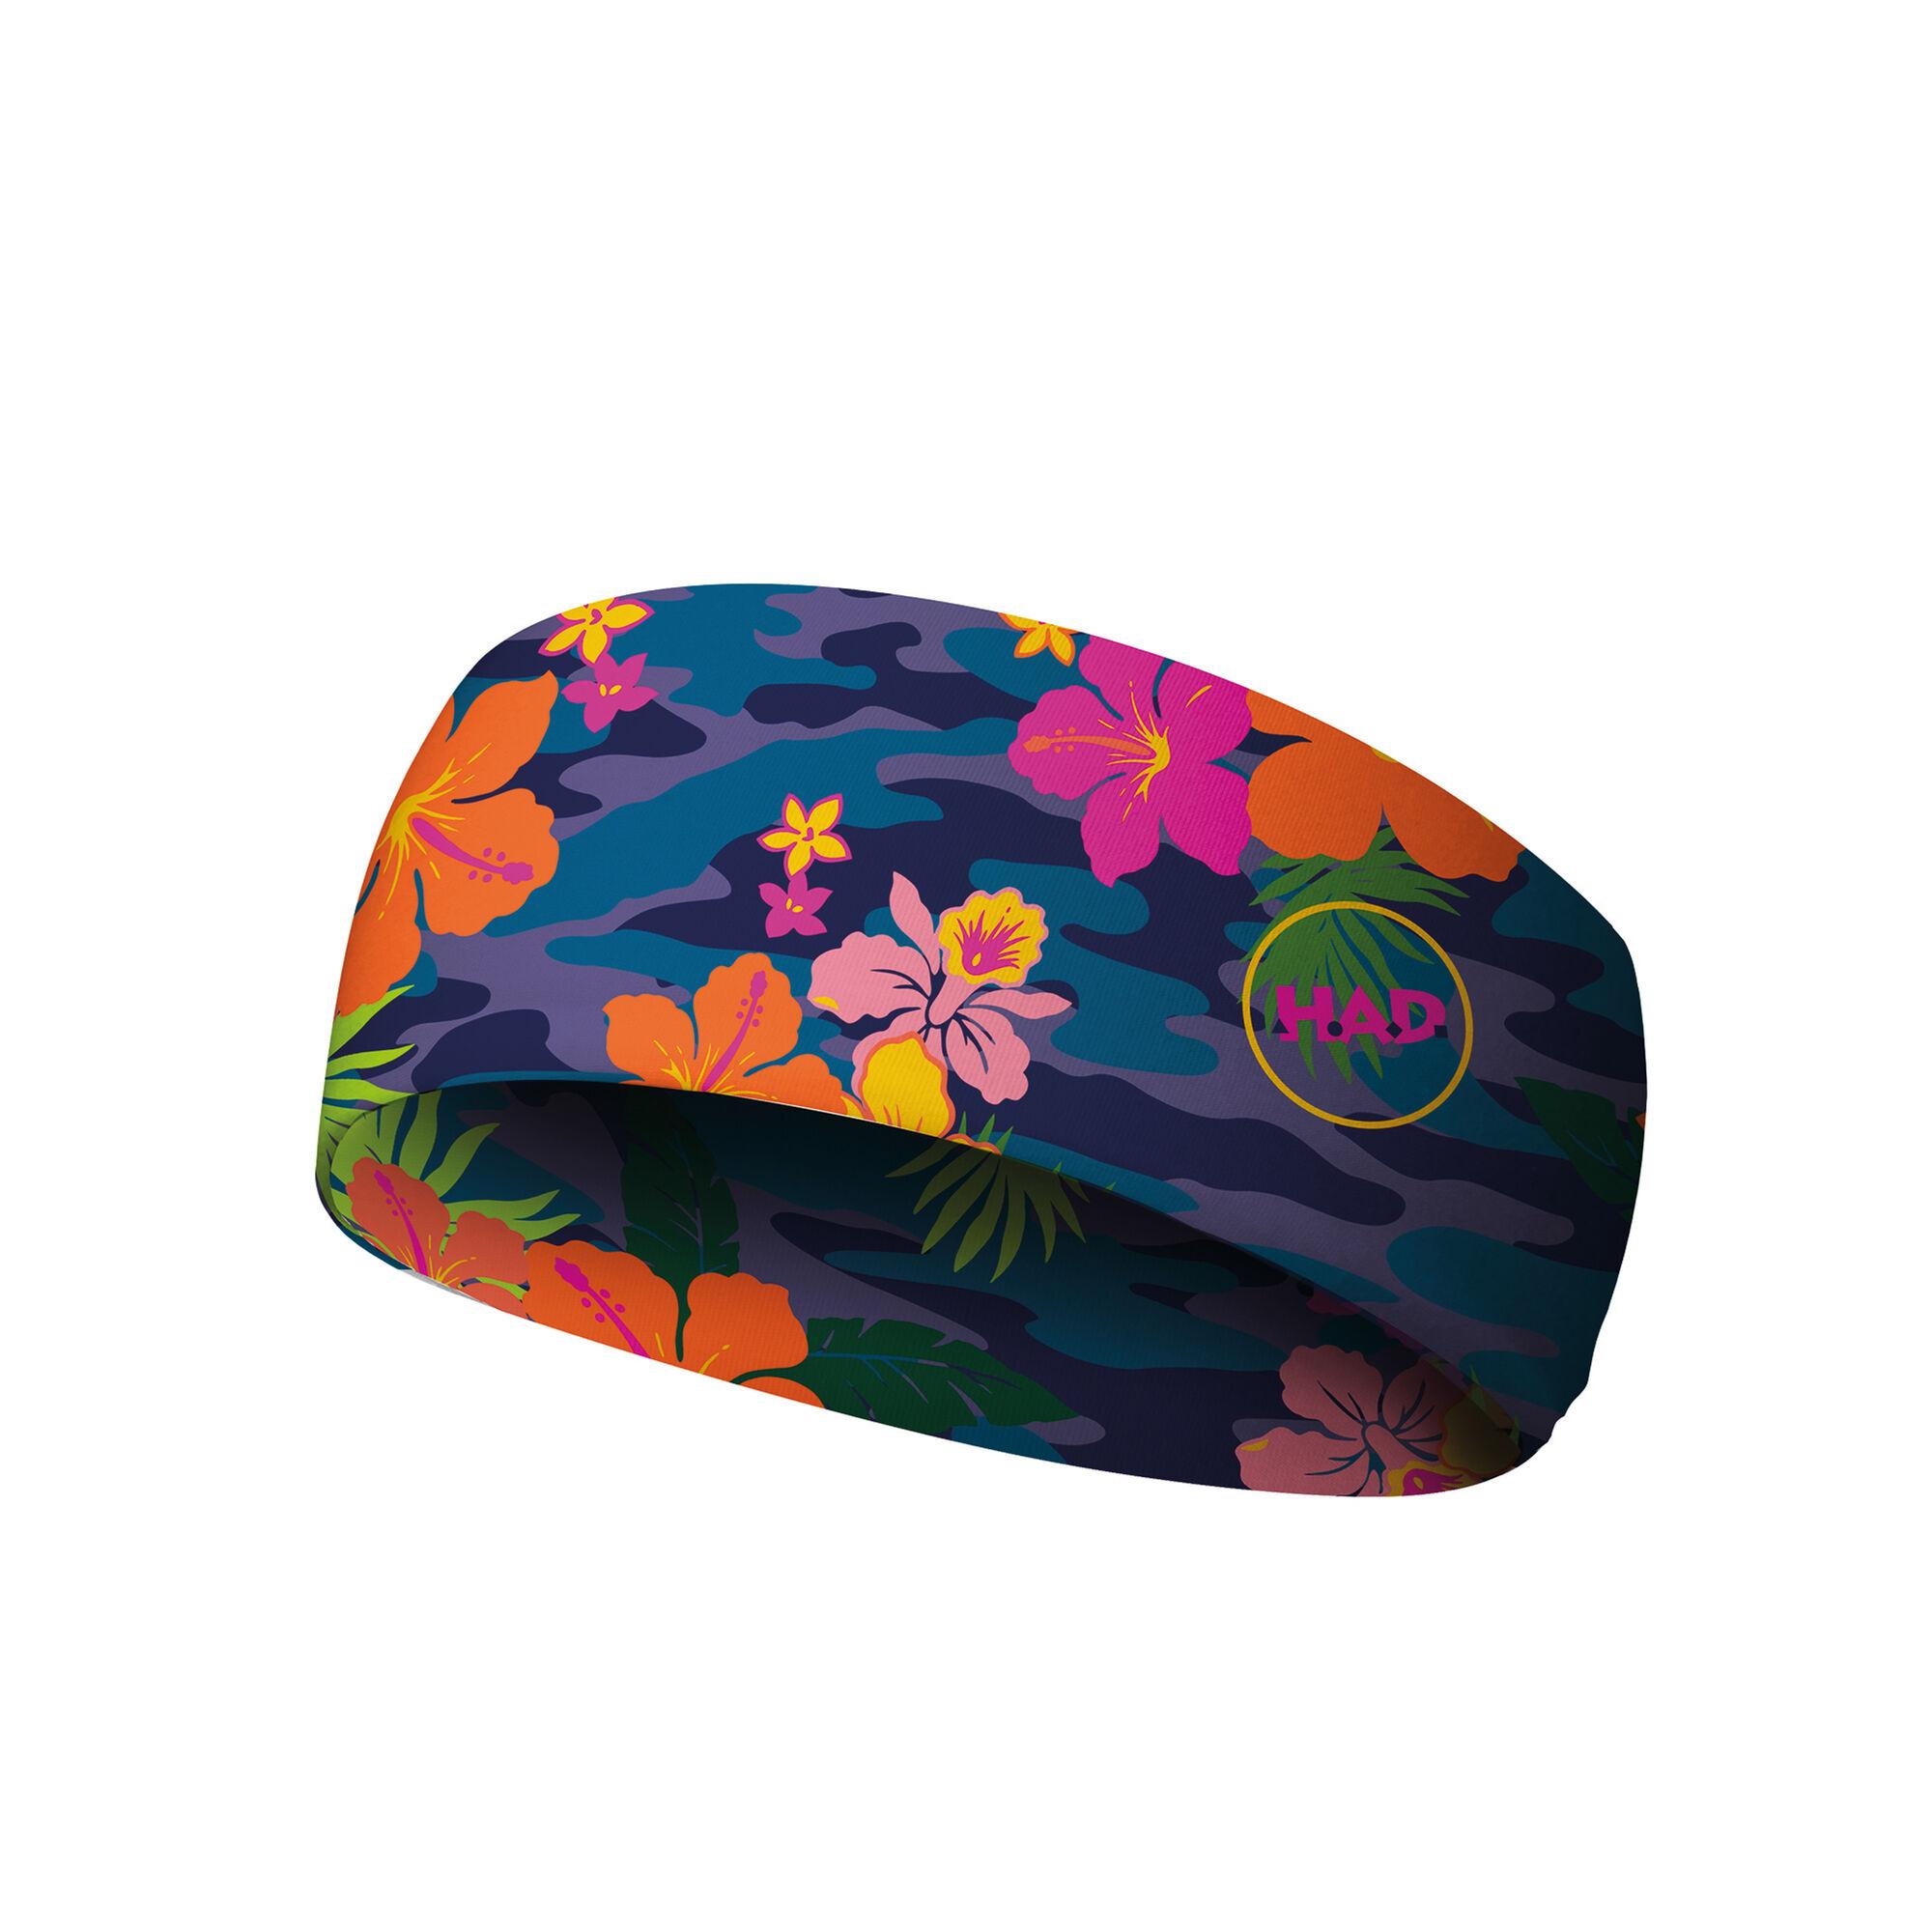 H.A.D. Coolmax Headband (Bahama Blumen)